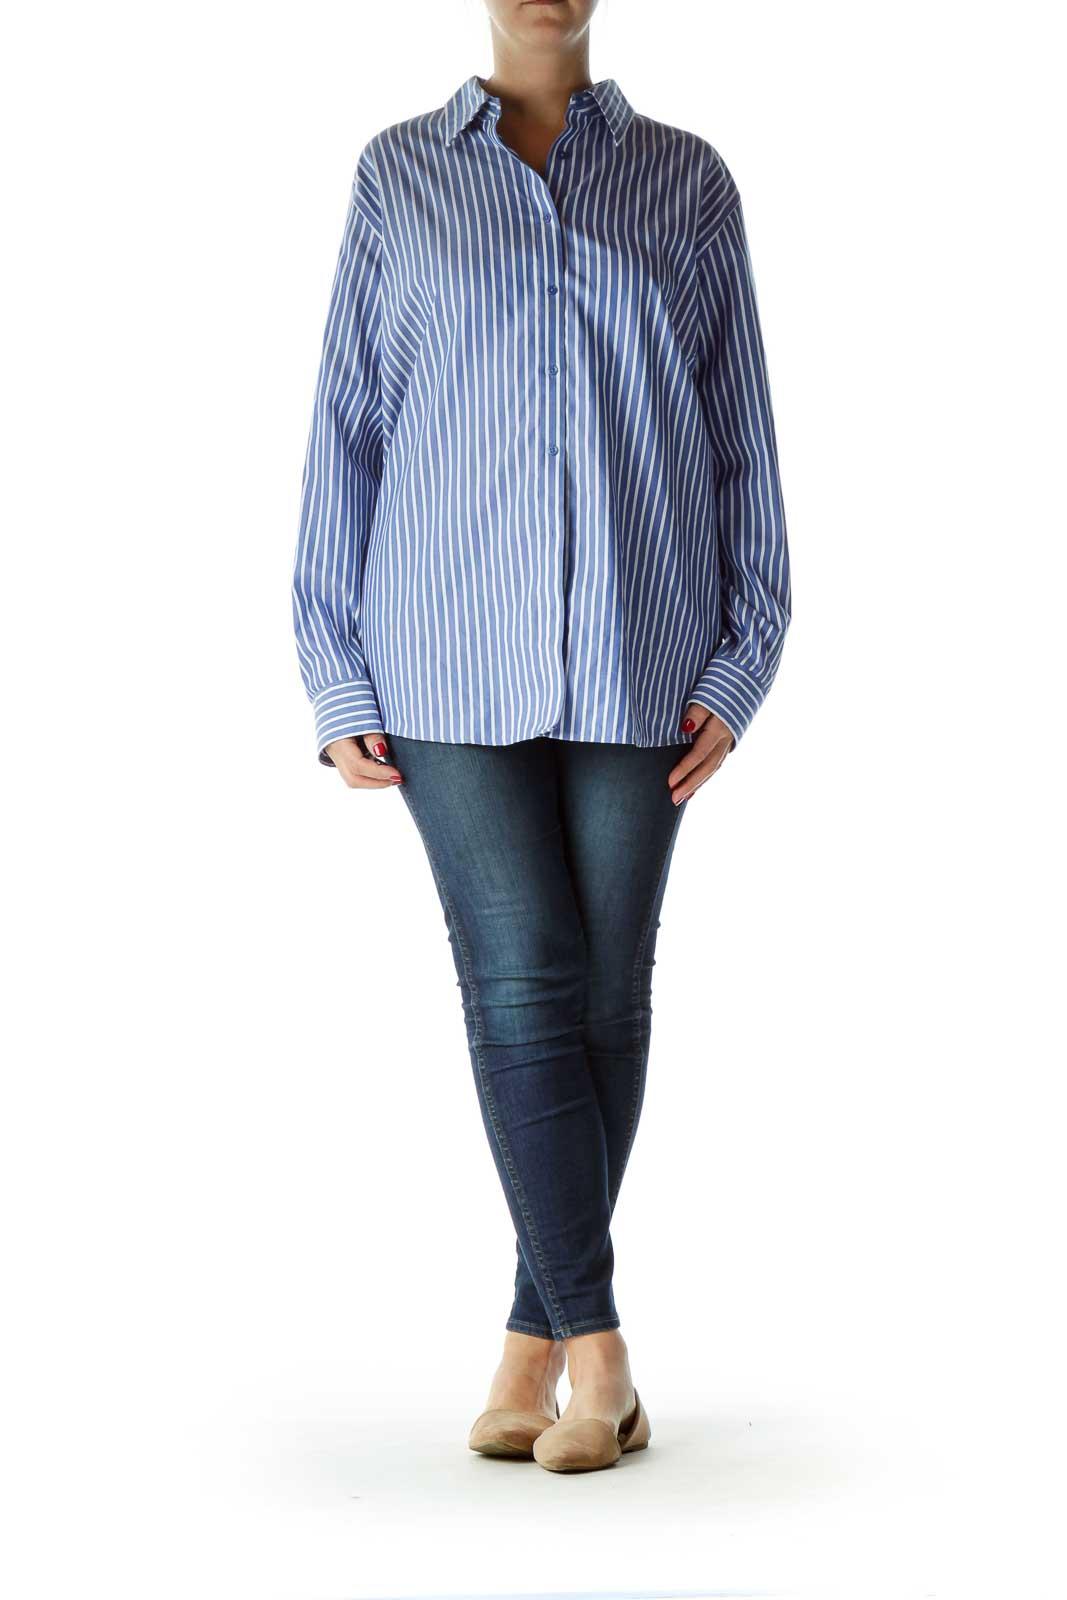 Blue White Pinstripe Collared Shirt